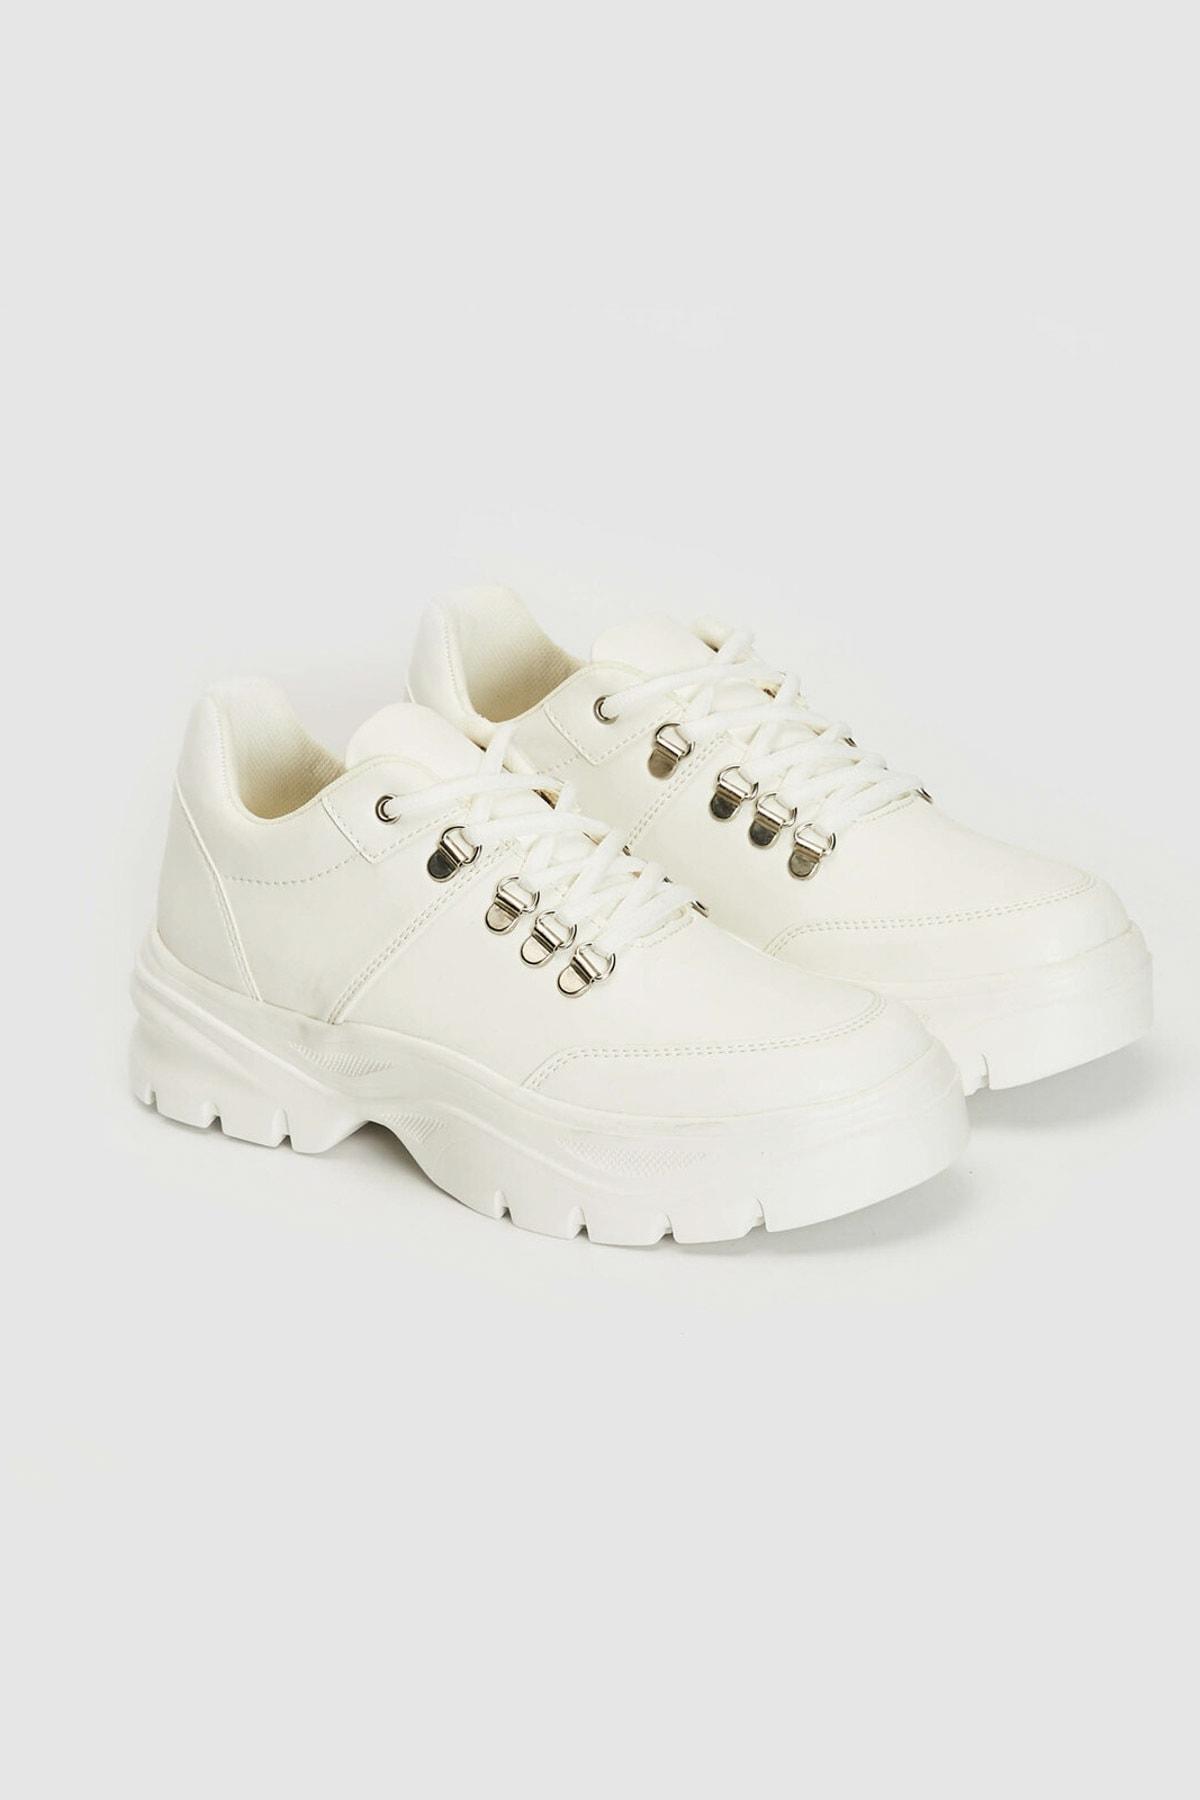 LC Waikiki Kadın Beyaz J5E Sneaker 0WEJ54Z8 2